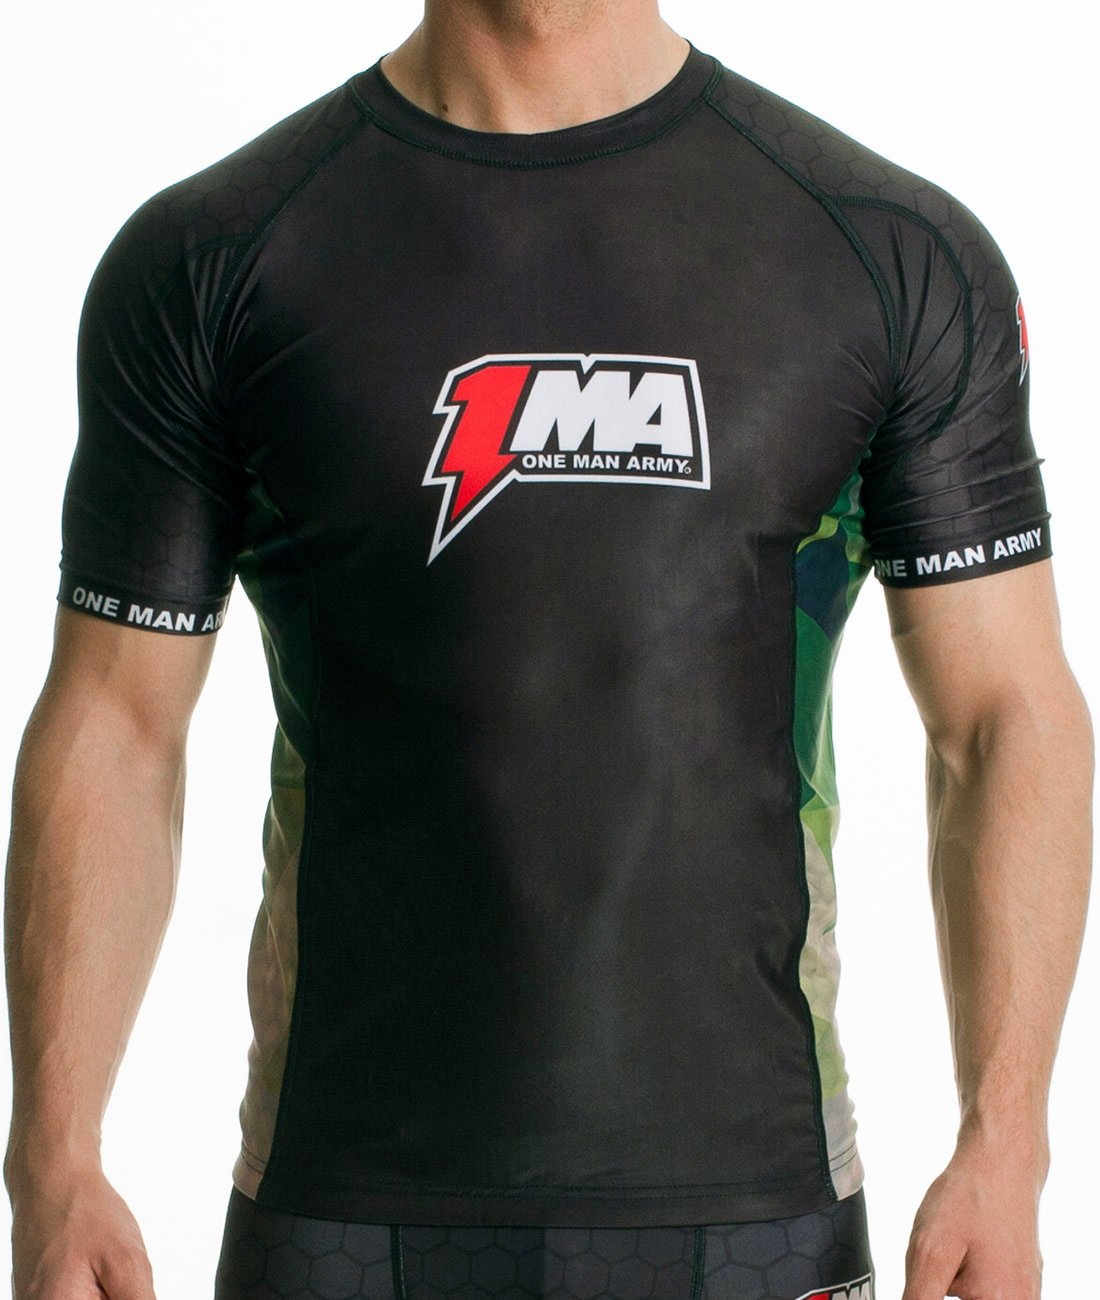 One Man Army Rashguard Short Sleeve Fitness MMA Grappling Fitness Sleeve Thaiboxen Boxen Funktionsshirt Atmungsaktiv Schwarz Camo Eng Kompression 2ad88e